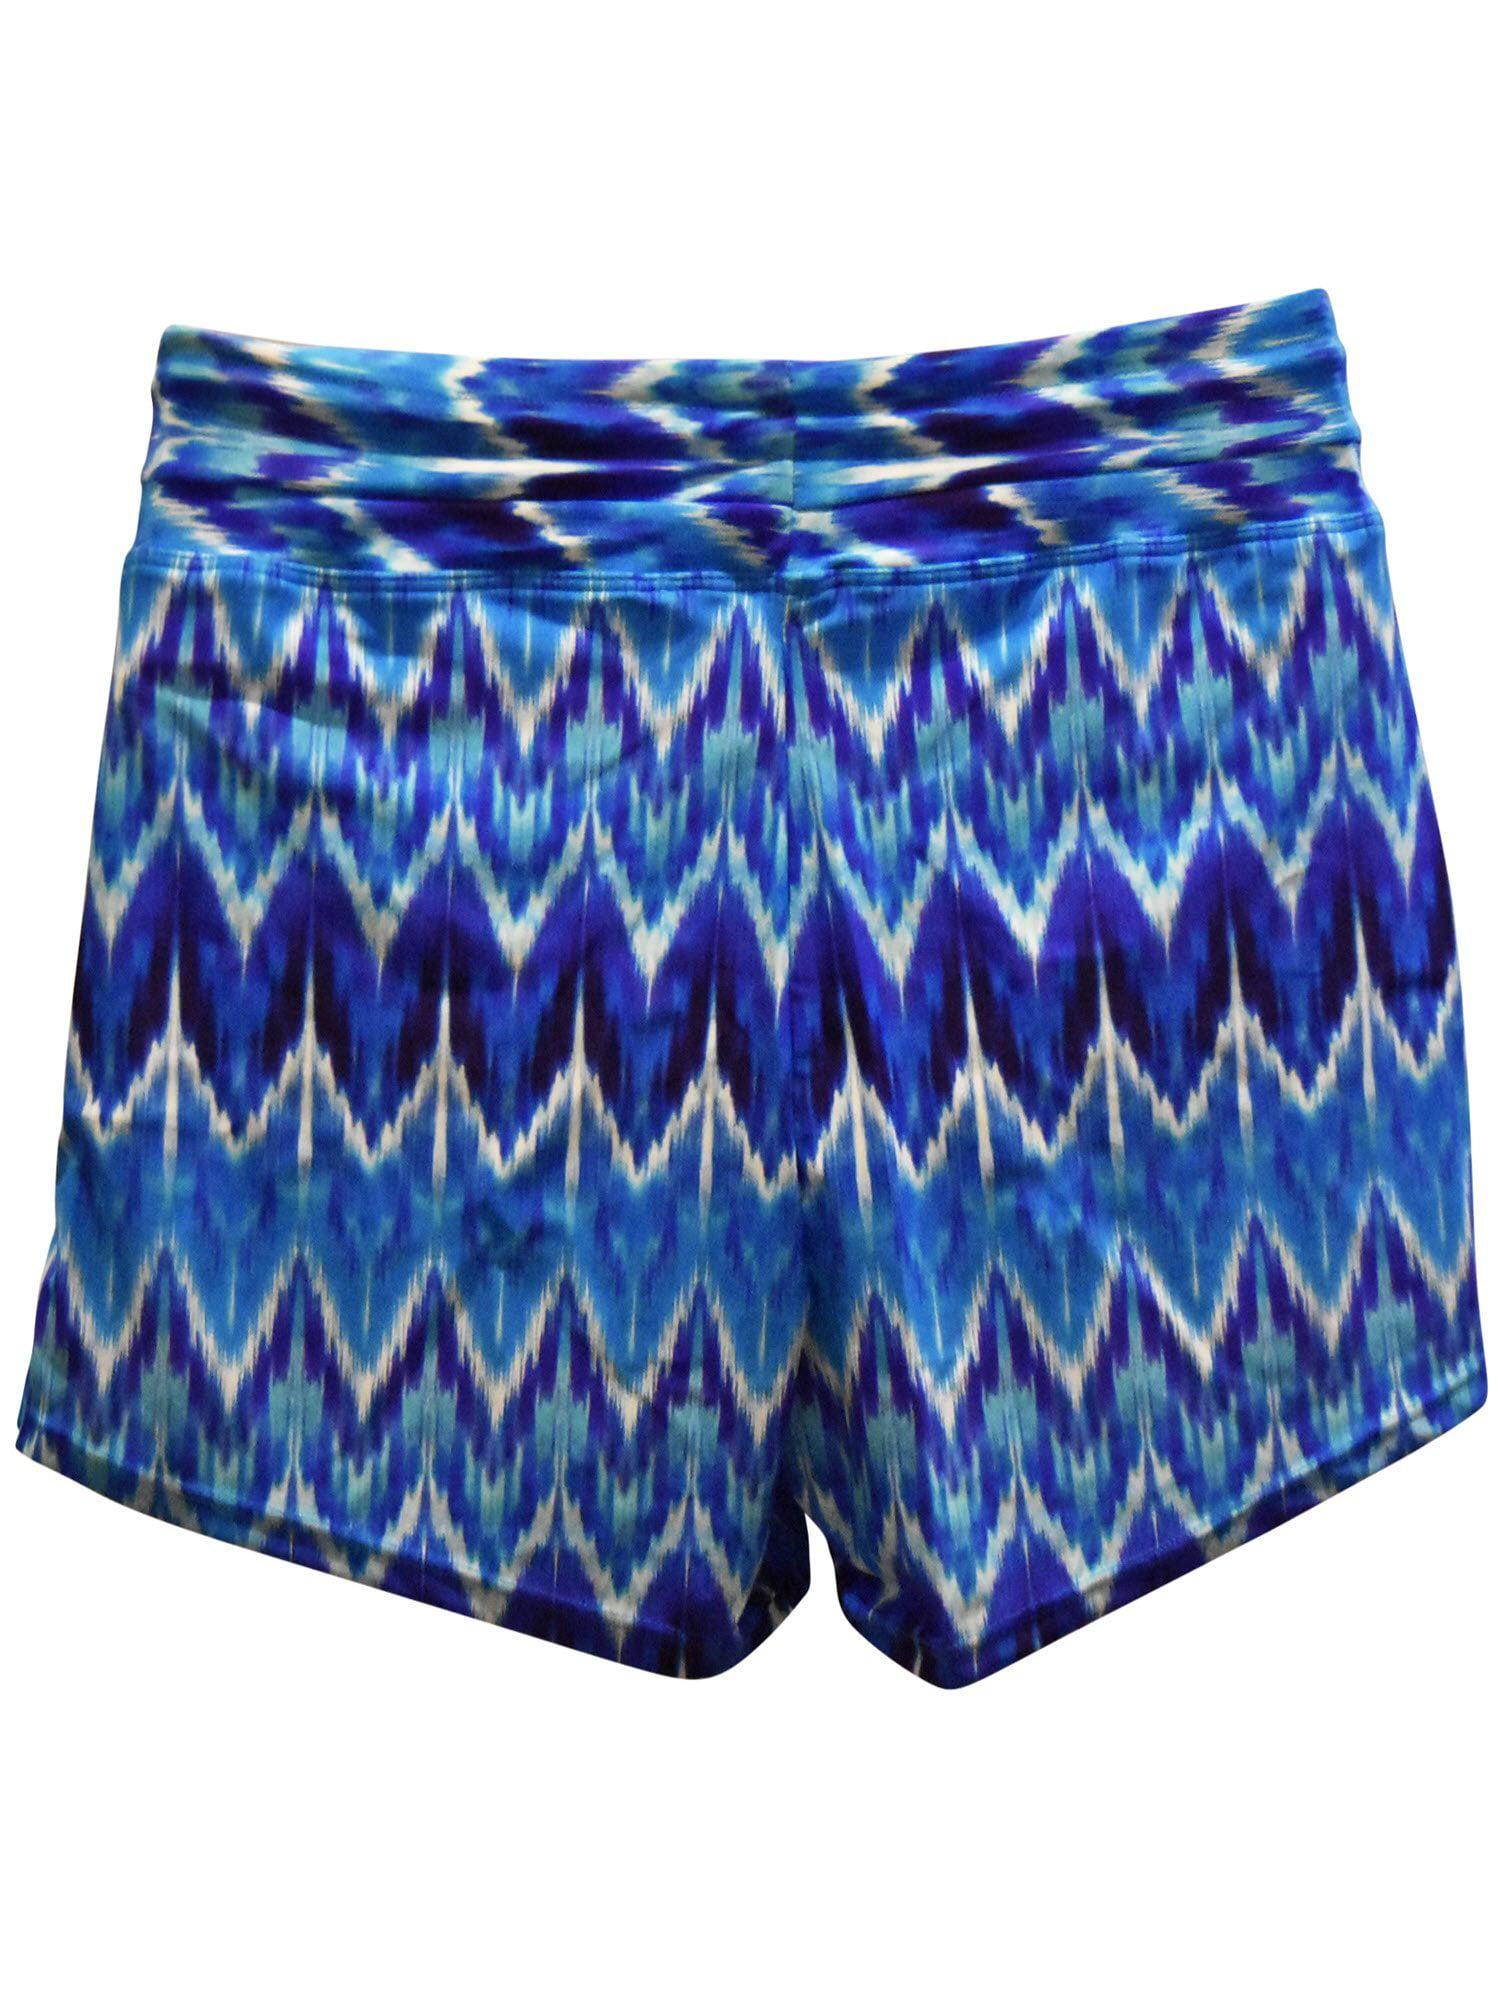 2db8a156f9 Heat Womens Swim Shorts Board Shorts Swimsuit Bottoms - Walmart.com